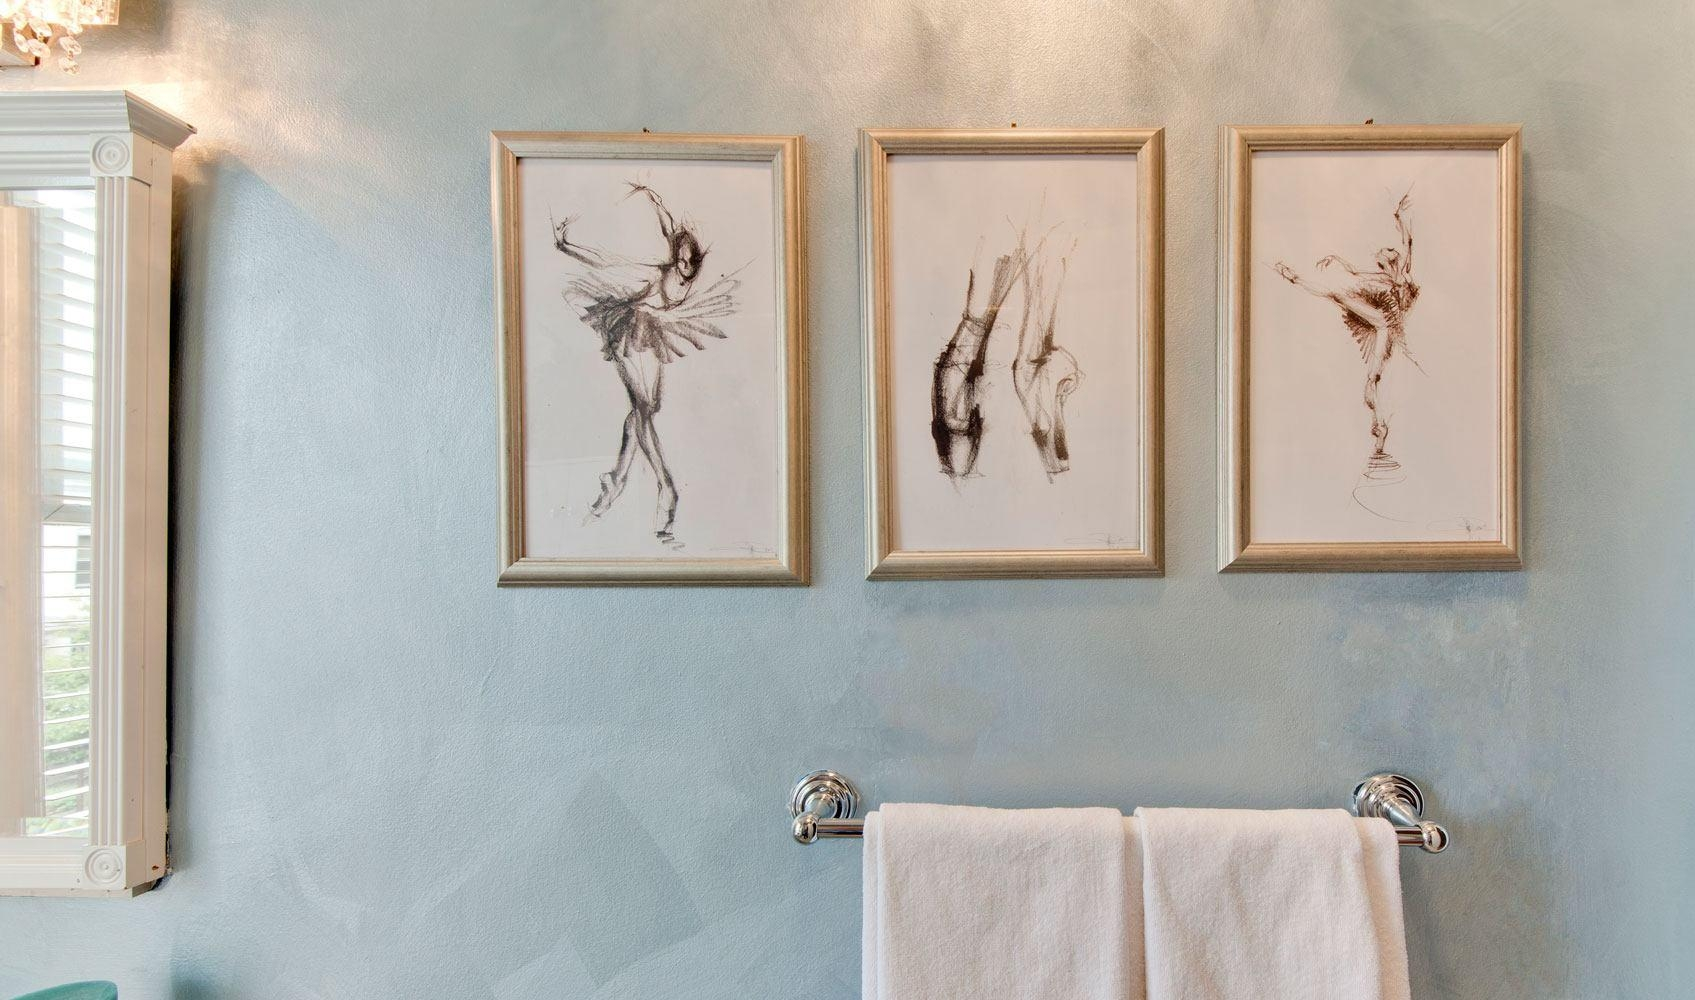 Bathroom Wall Art Décor, 14 Photo | Bathroom Designs Ideas Inside Shower Room Wall Art (Image 4 of 20)